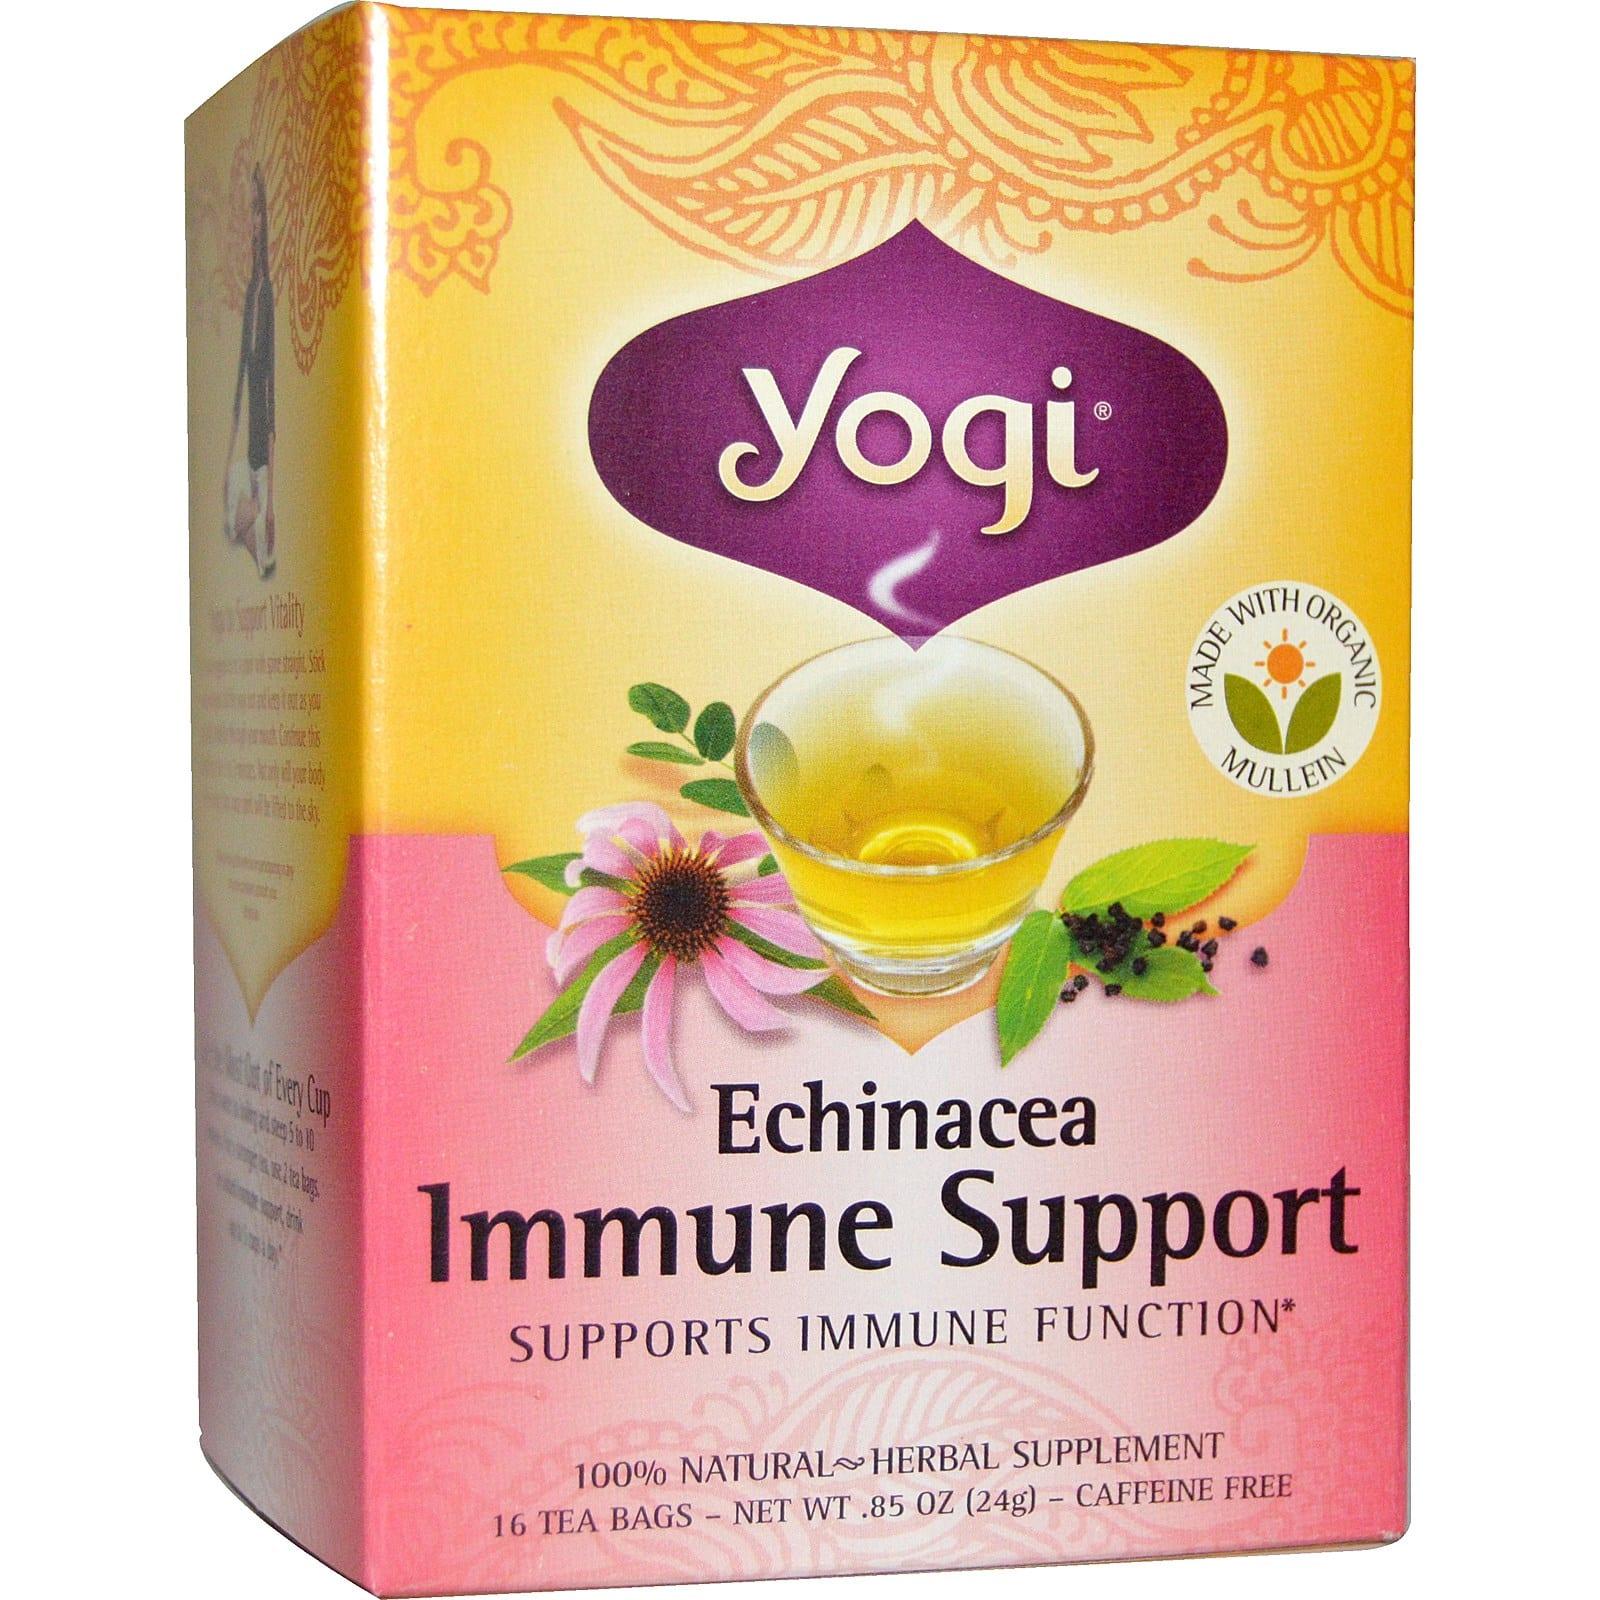 Feel Better with YOGI Enchinacea Tea.